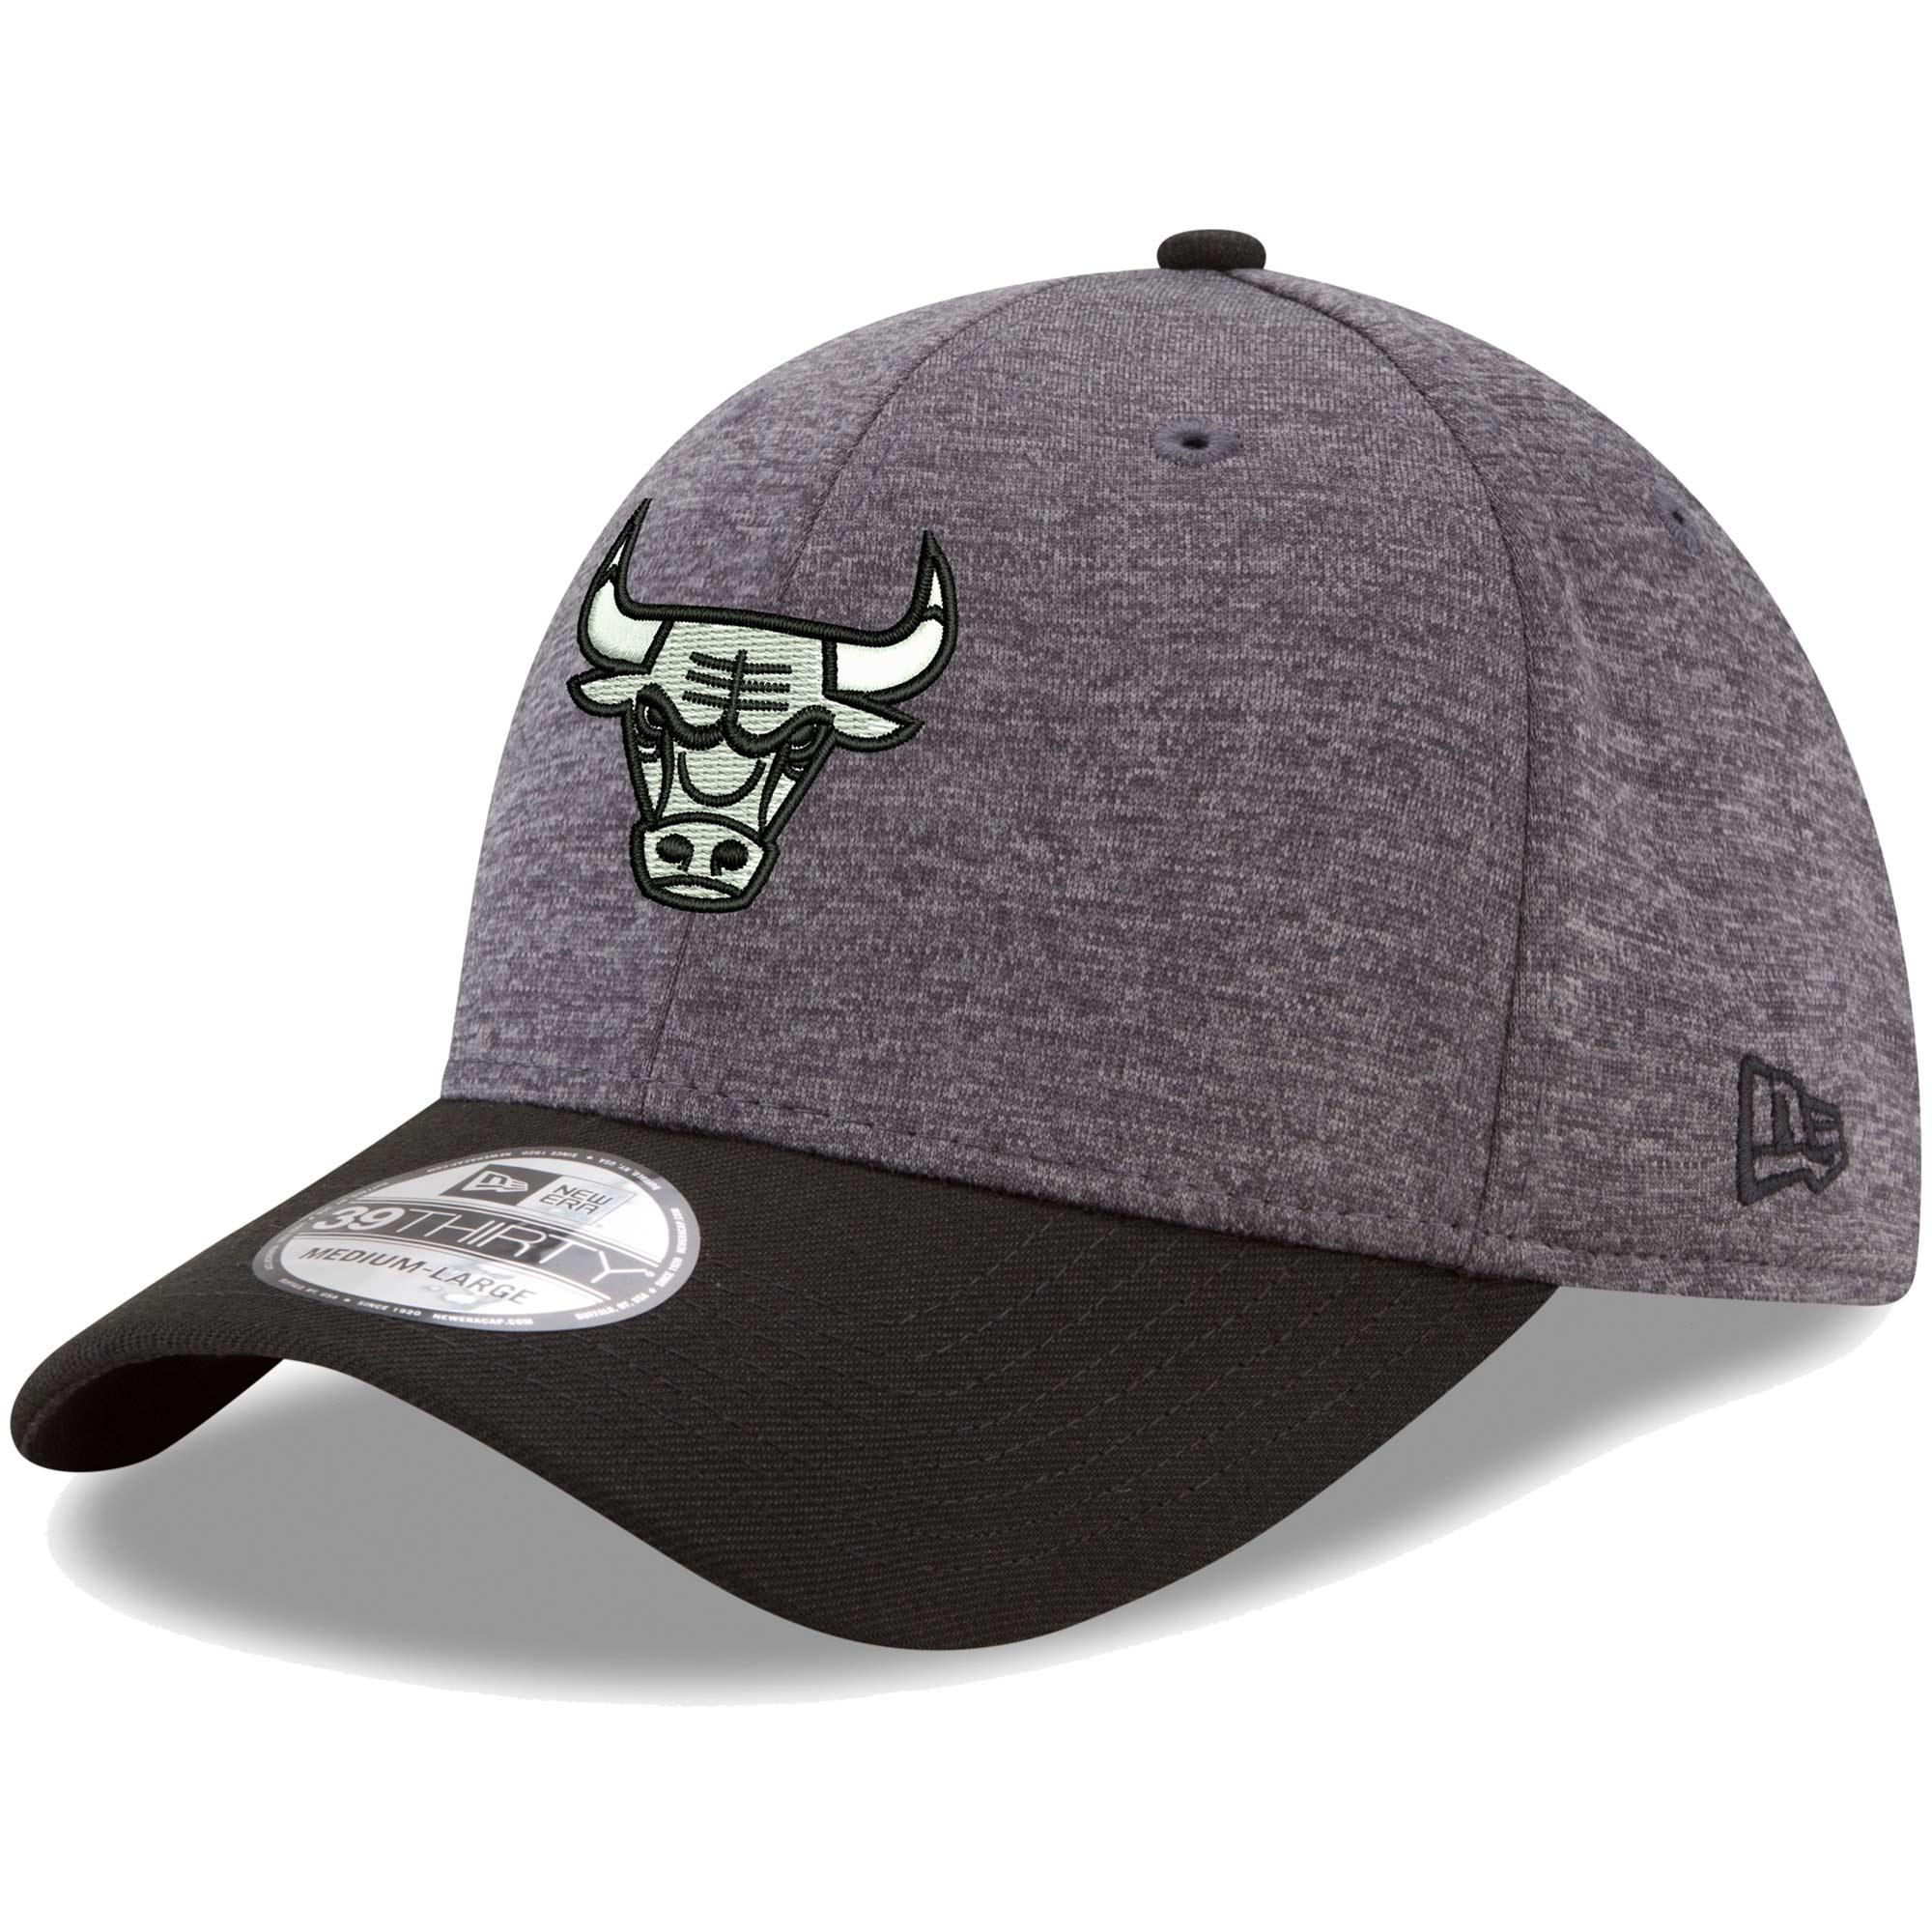 Chicago Bulls New Era 39THIRTY Flex Hat - Heathered Gray/Black